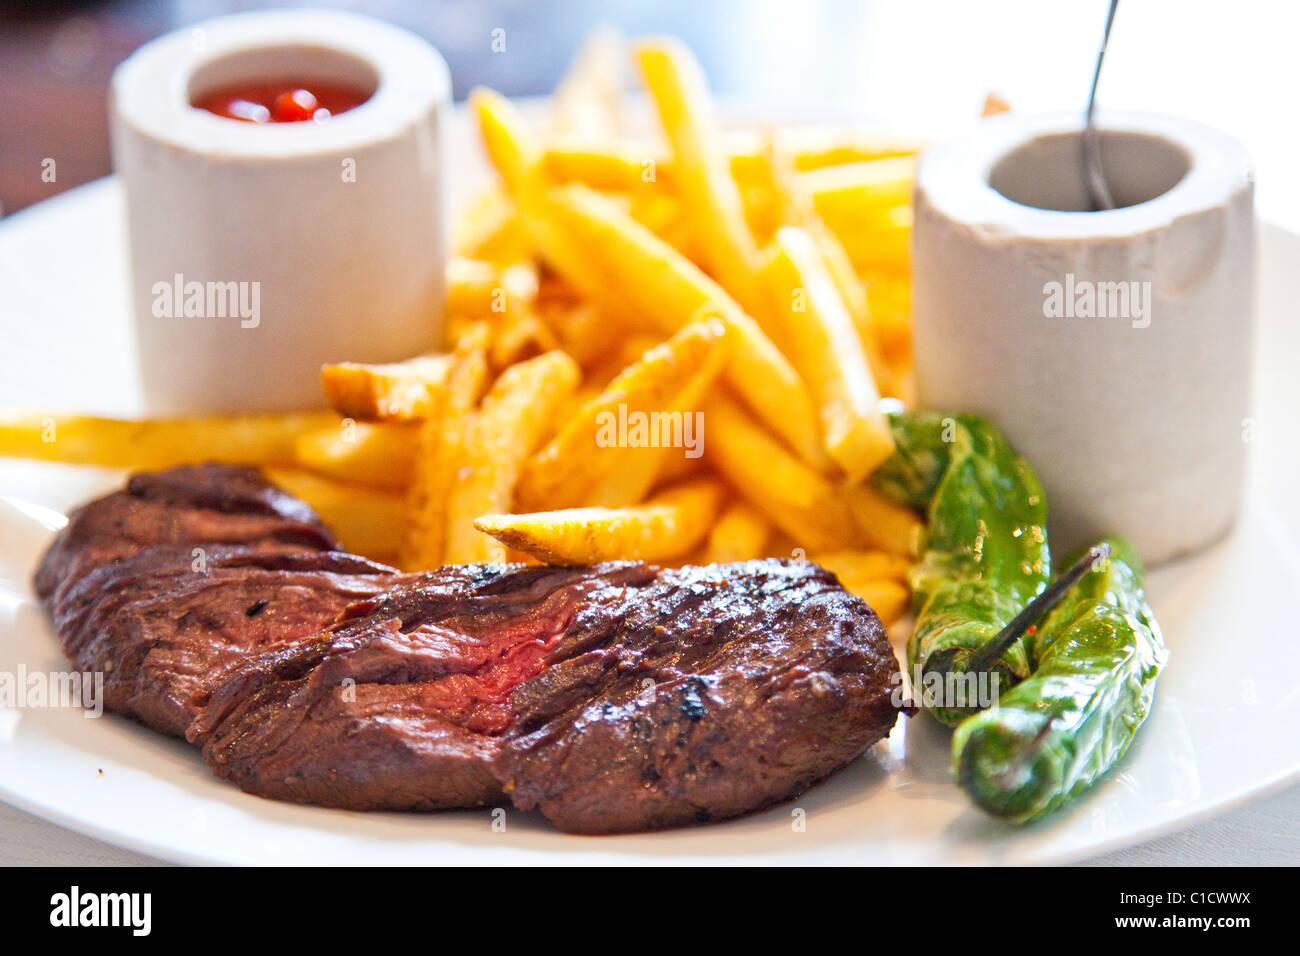 Prime hanger steak and frites, J&G Steakhouse at the W Hotel, Washington DC - Stock Image